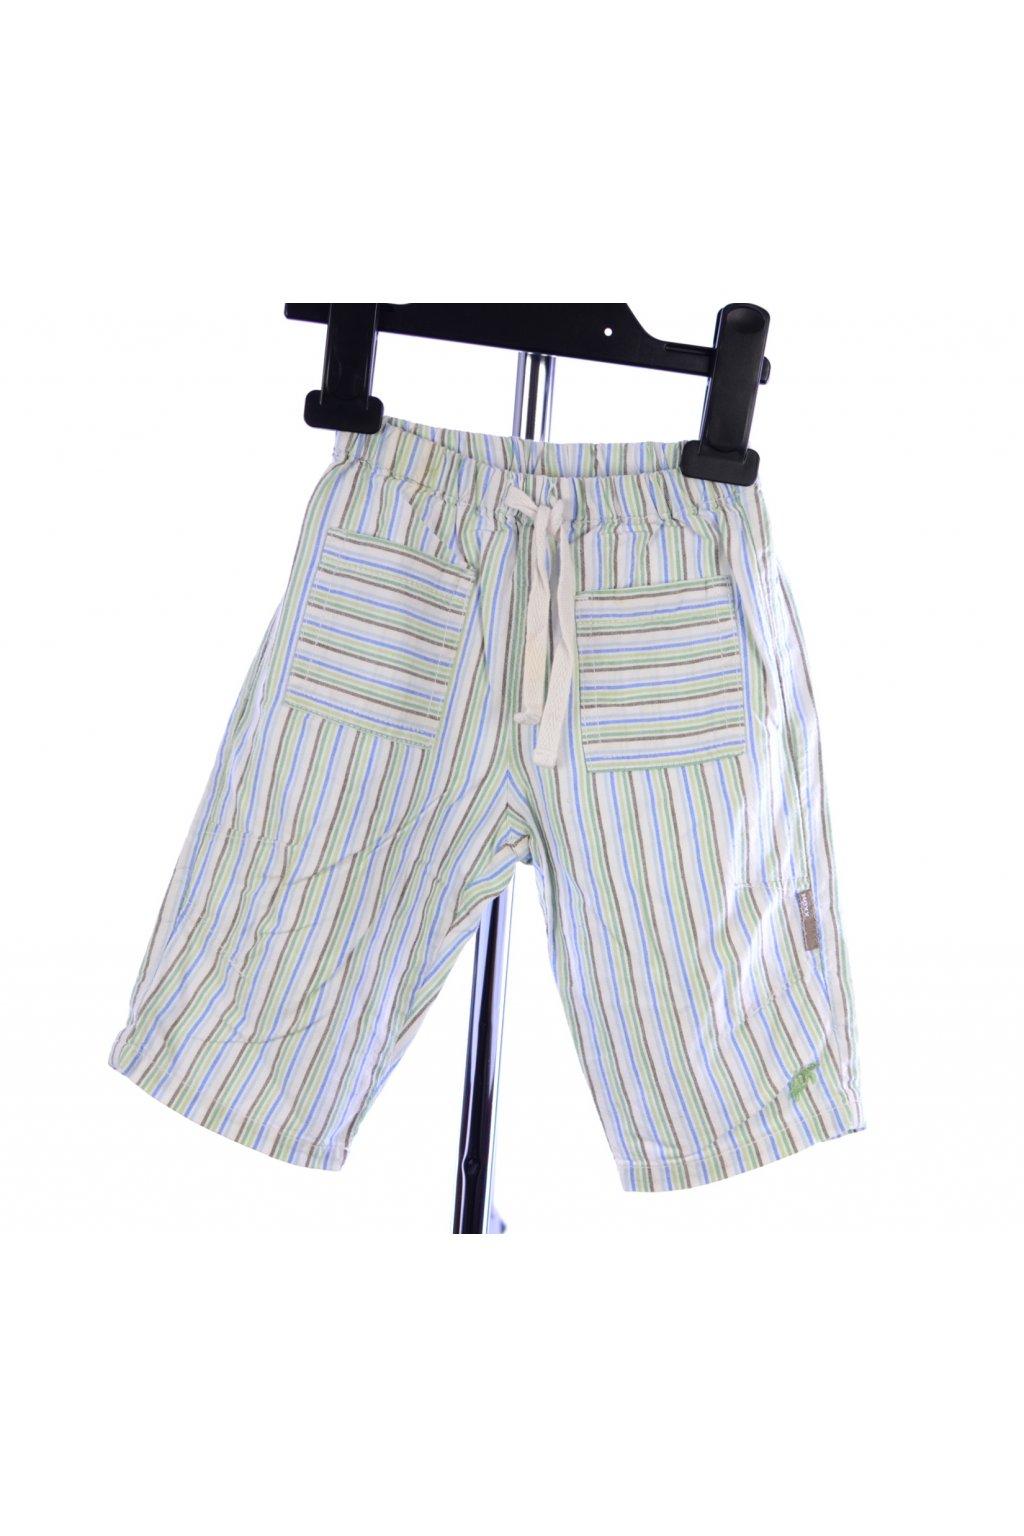 Kalhoty tepláky Mexx vel. 68